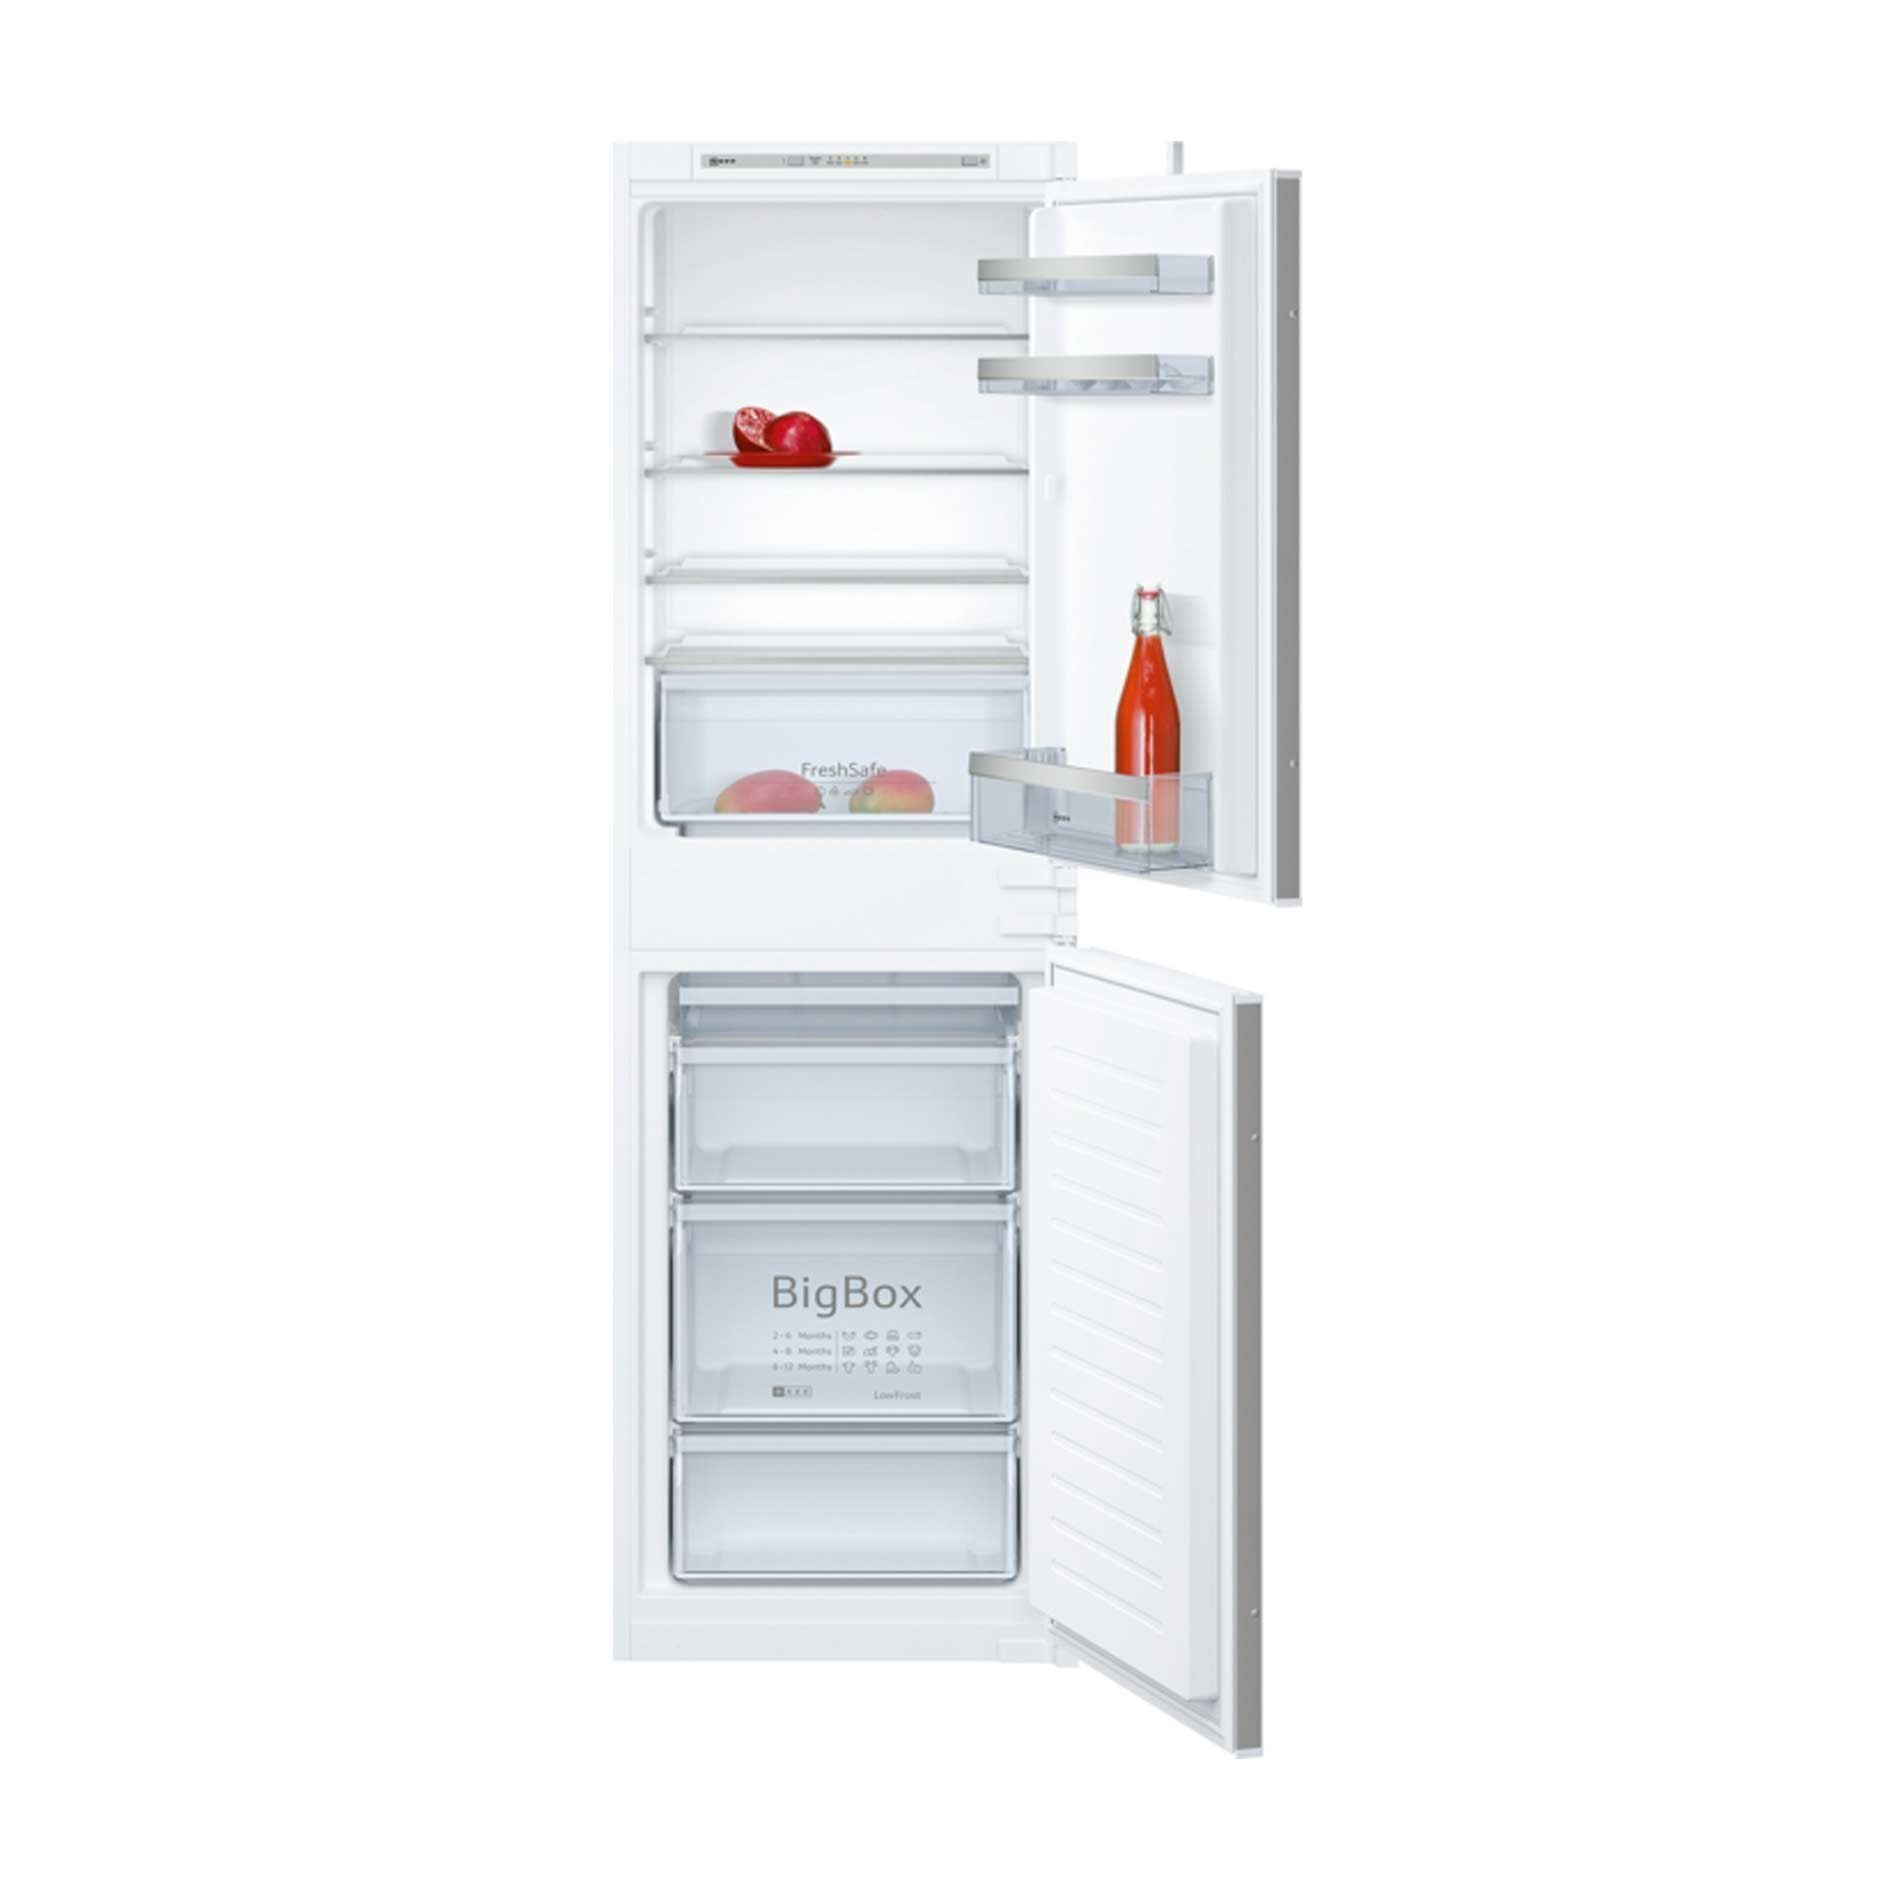 Picture of KI5852S30G 50:50 Integrated Fridge/Freezer